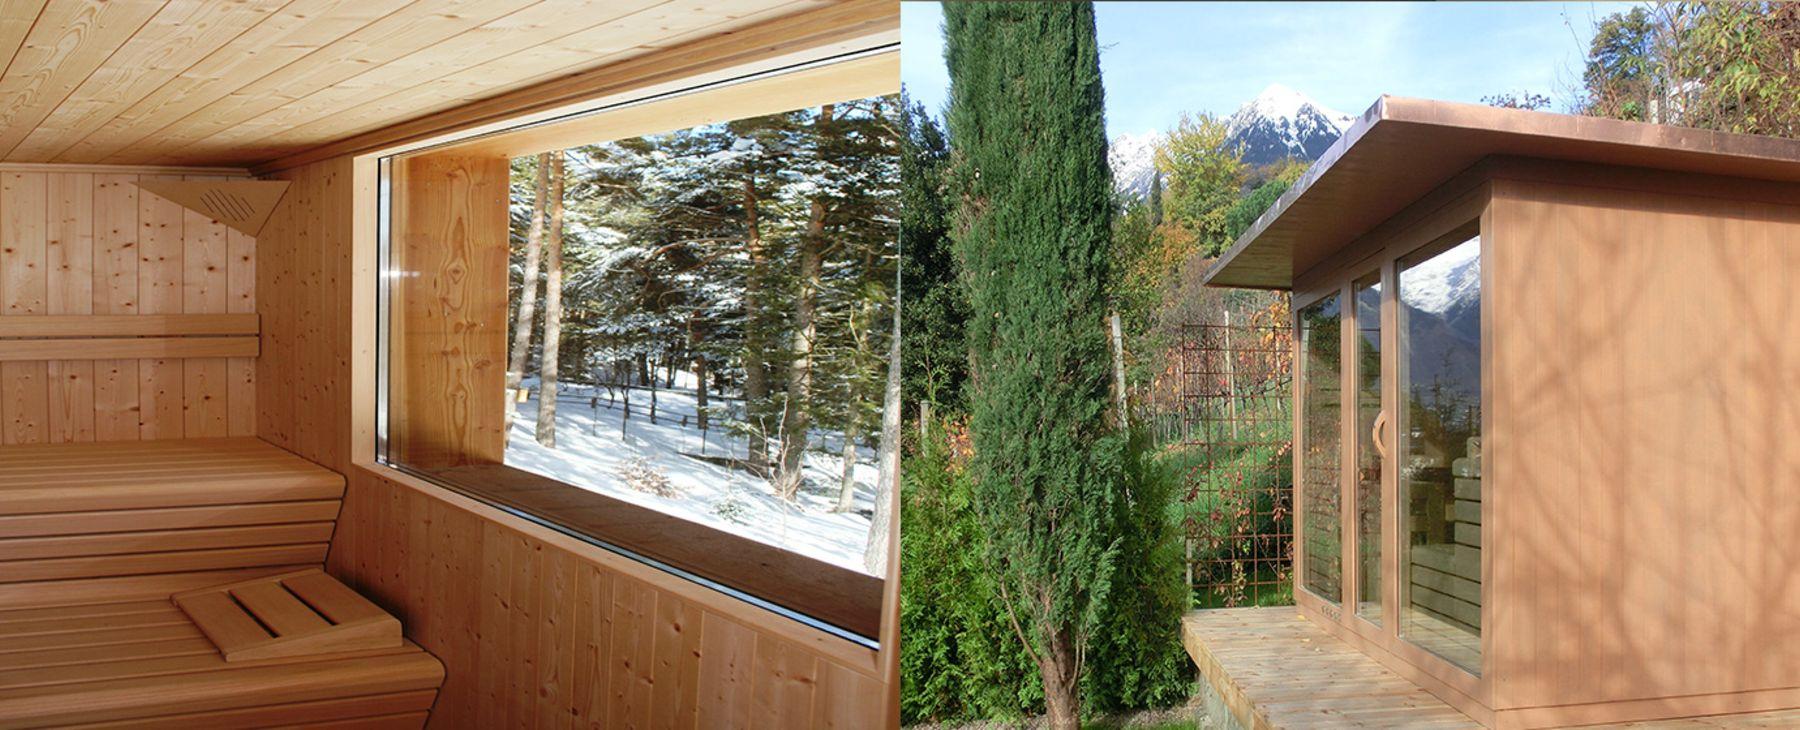 sauna schaller aussensauna aus s dtirol. Black Bedroom Furniture Sets. Home Design Ideas